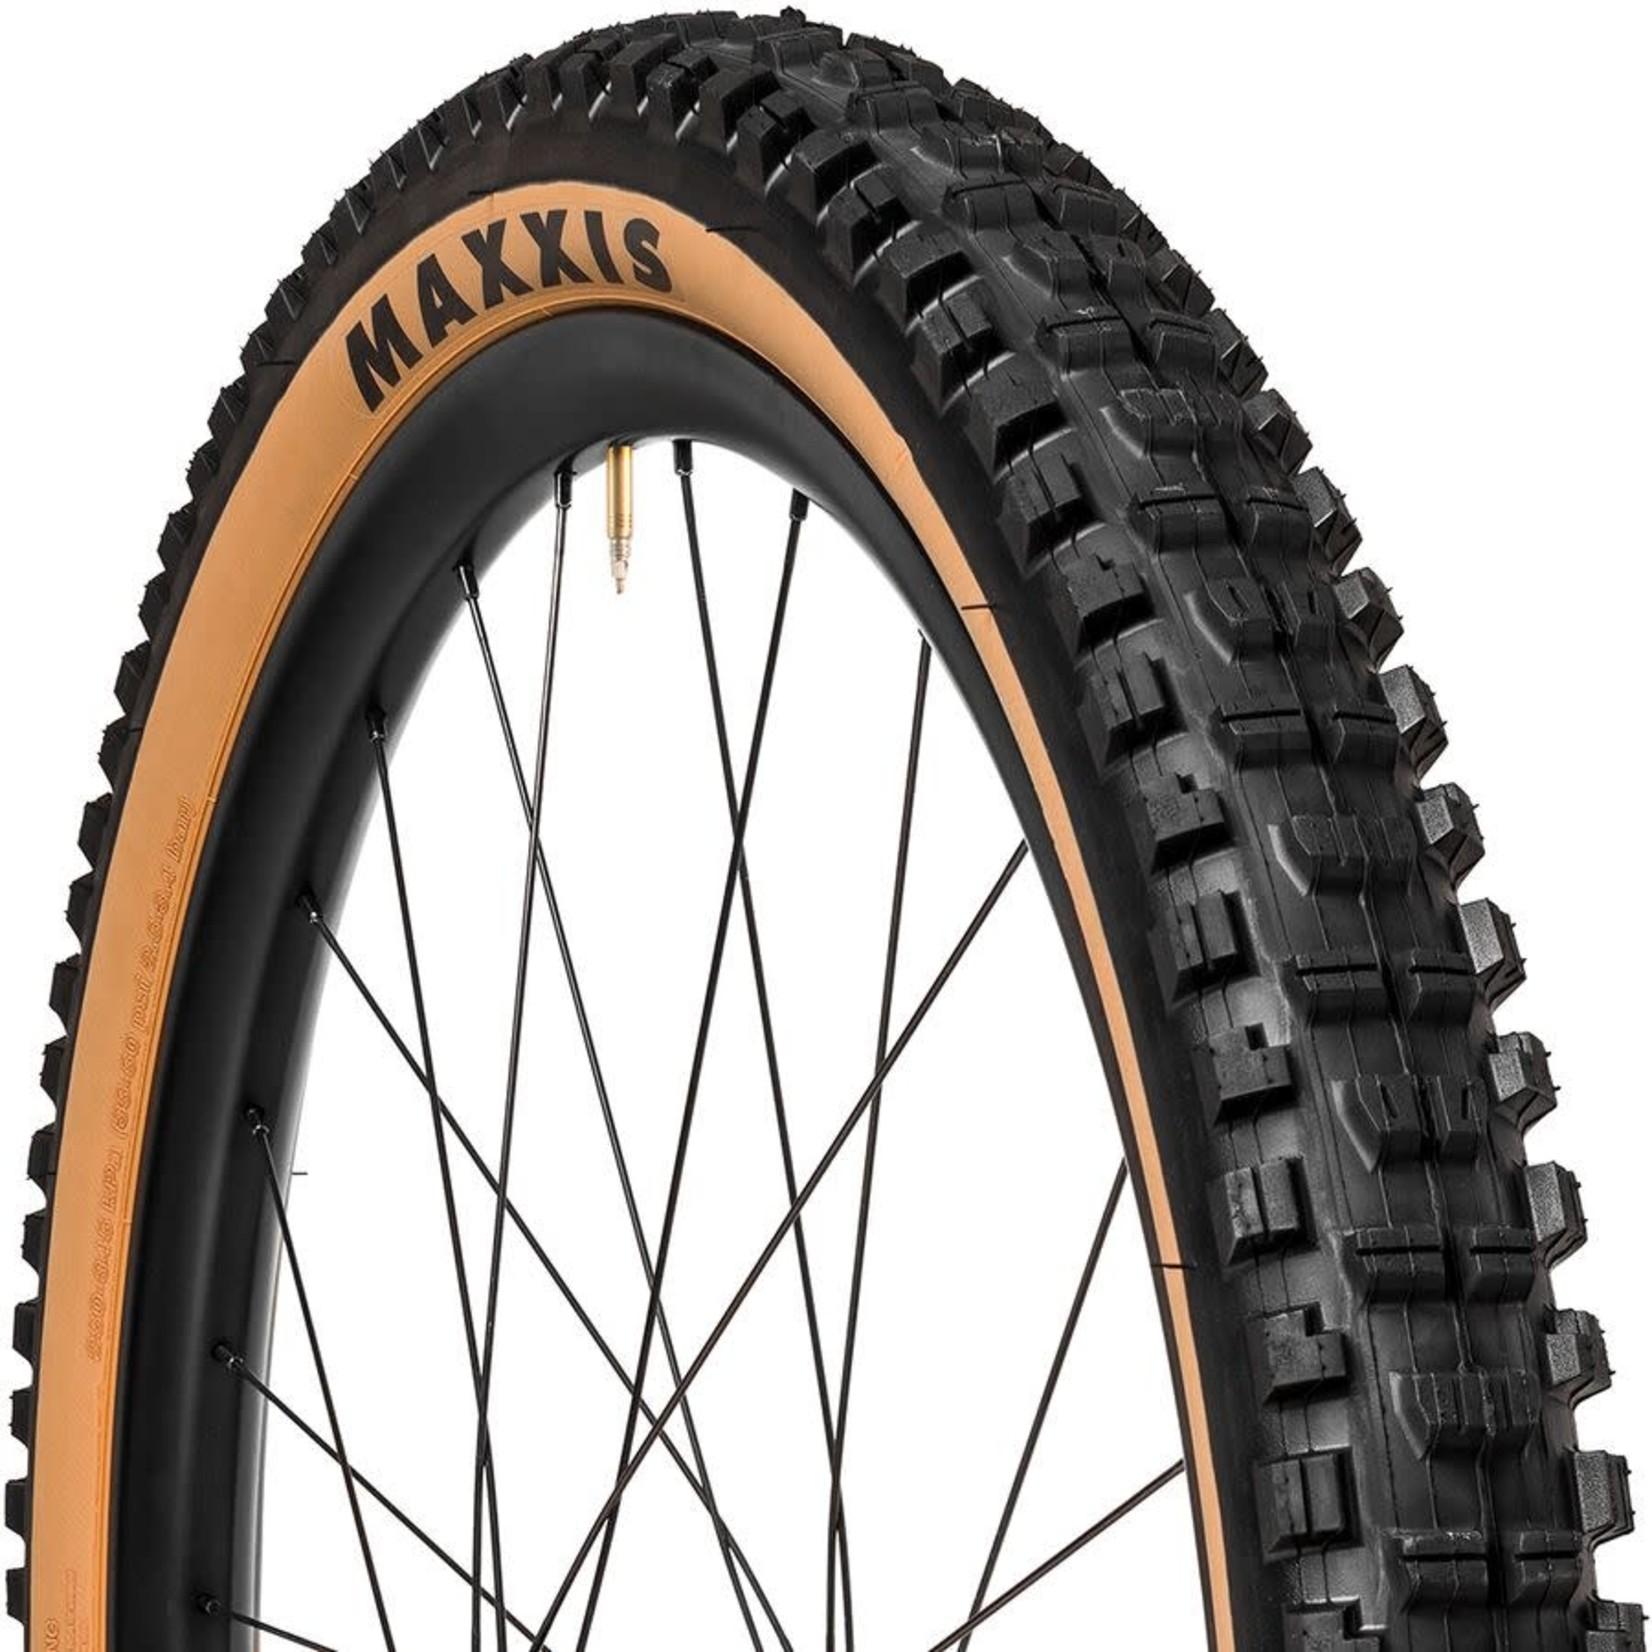 Maxxis Maxxis Minion DHF Tire - 27.5 x 2.3, Tubeless, Folding, Black/Tan, 3C Maxx Terra, EXO